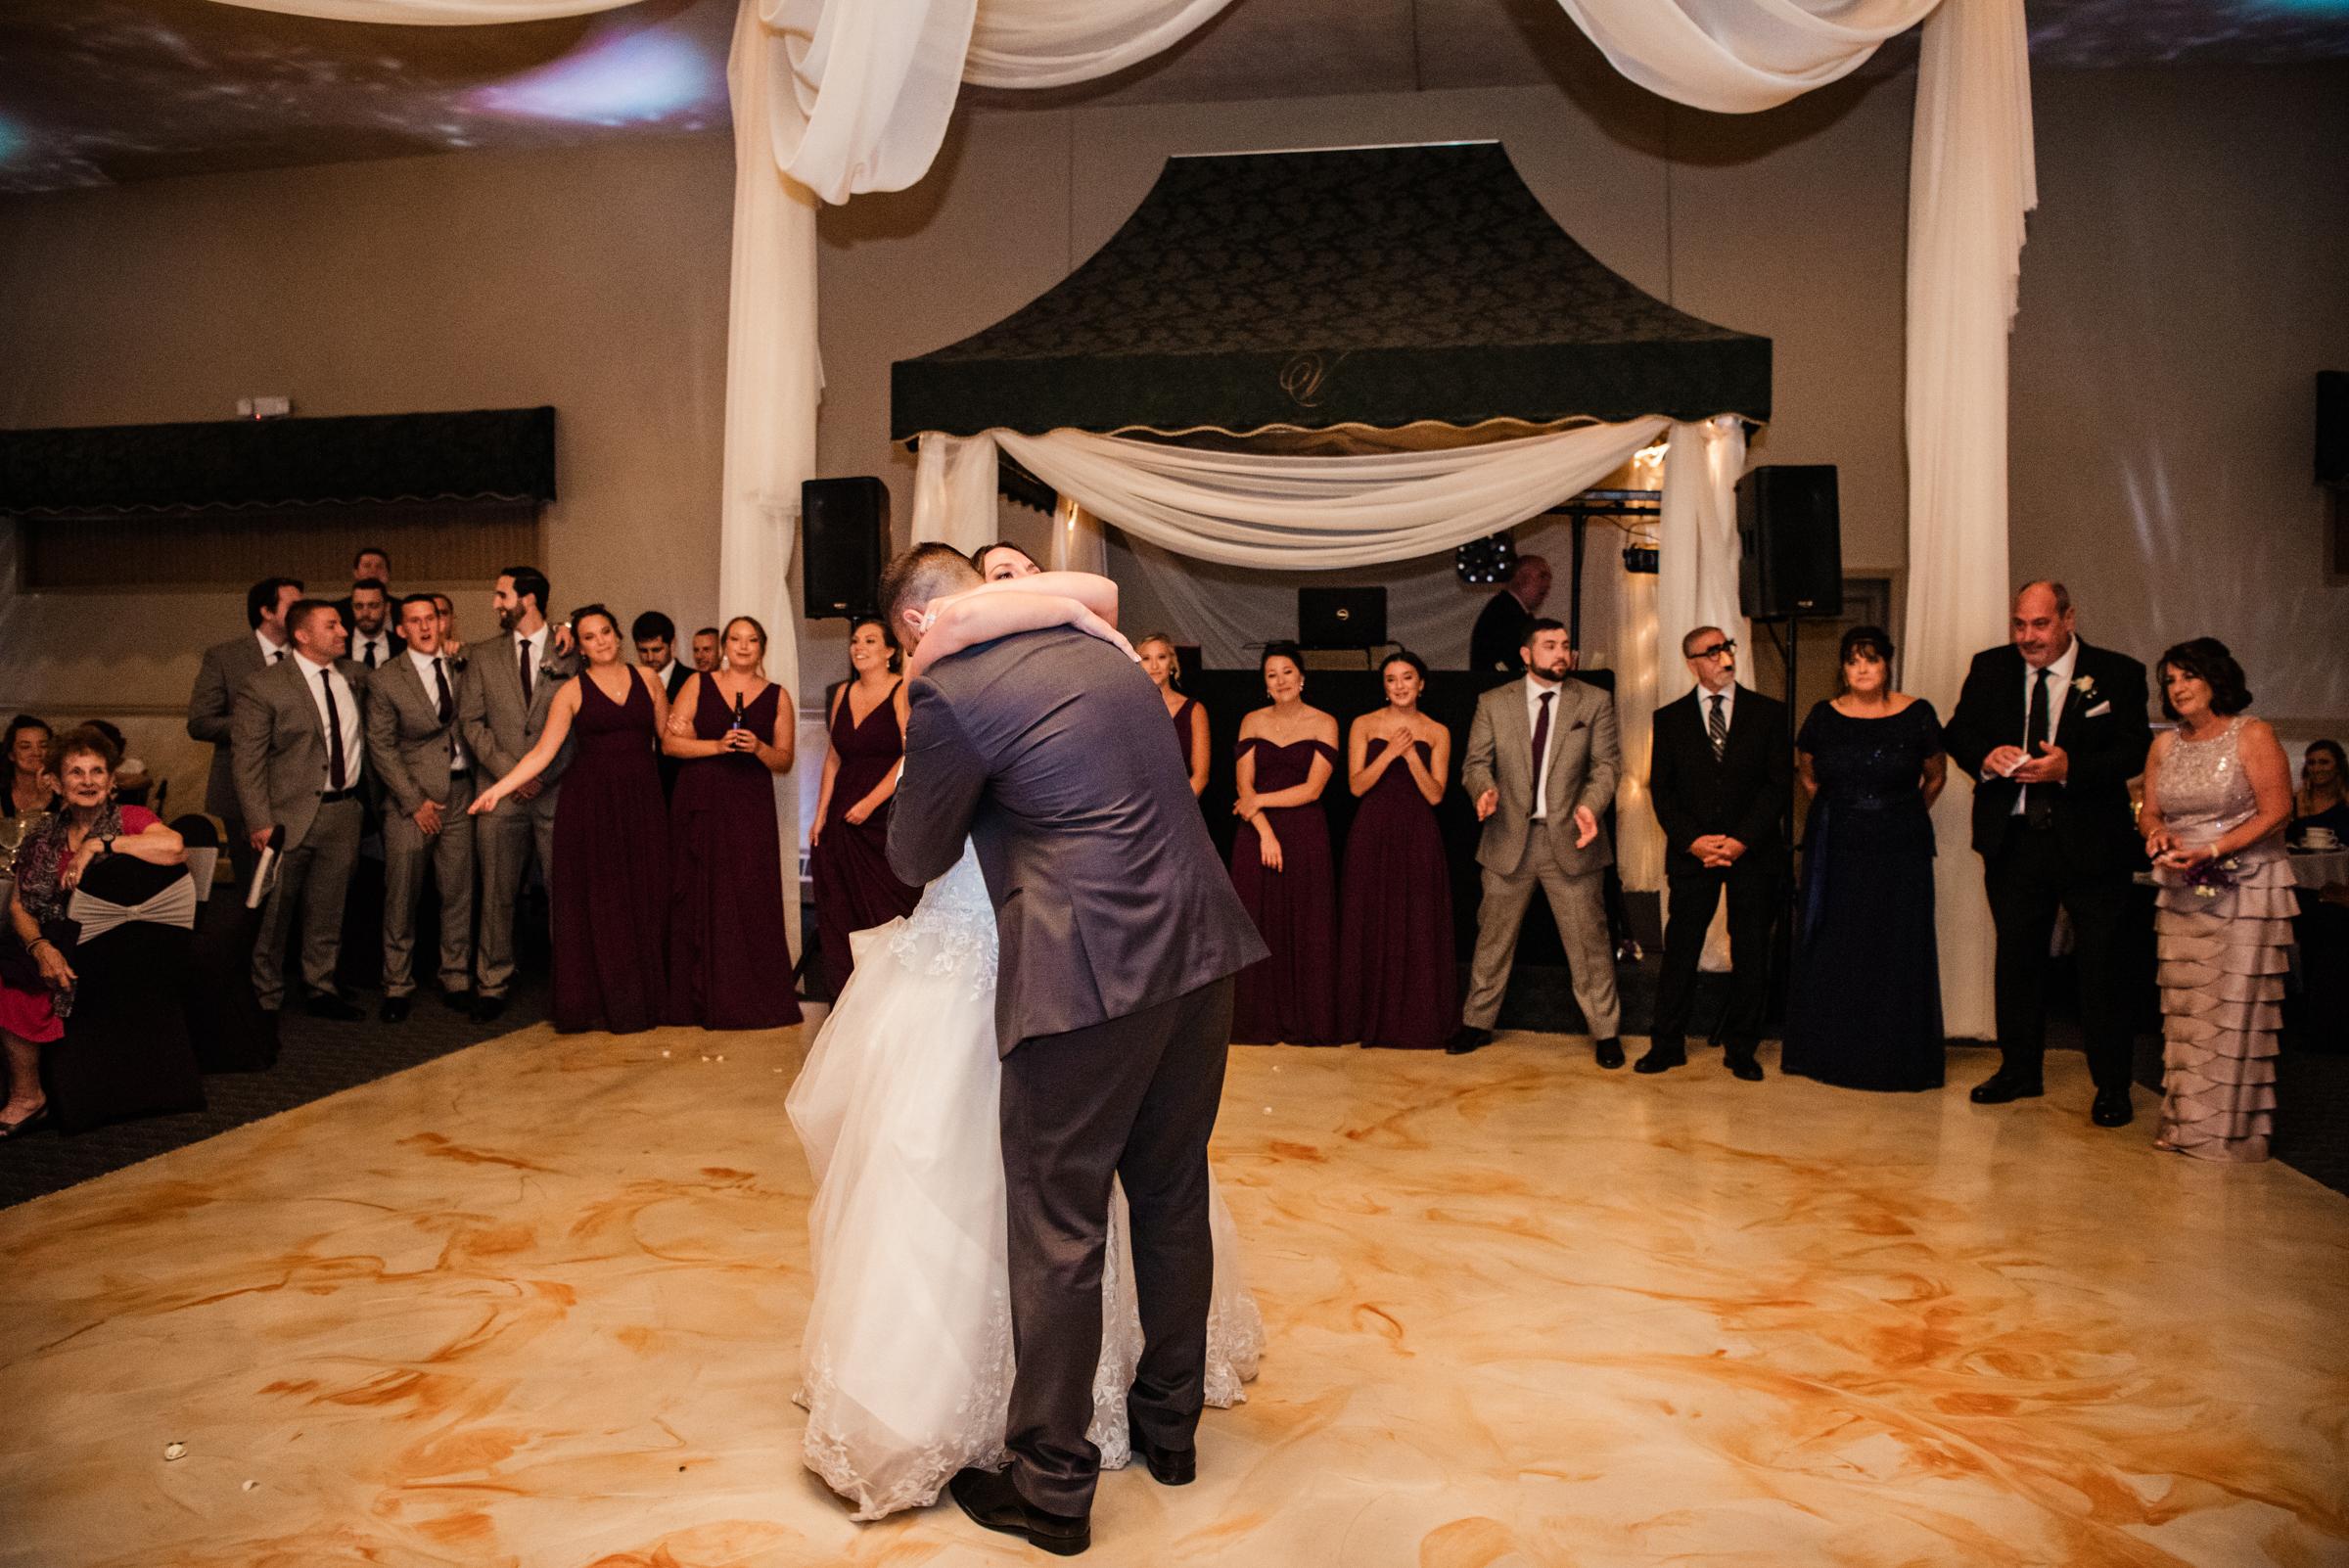 Historic_Old_St_Johns_Church_Valentinos_Banquet_Hall_Central_NY_Wedding_JILL_STUDIO_Rochester_NY_Photographer_DSC_6678.jpg